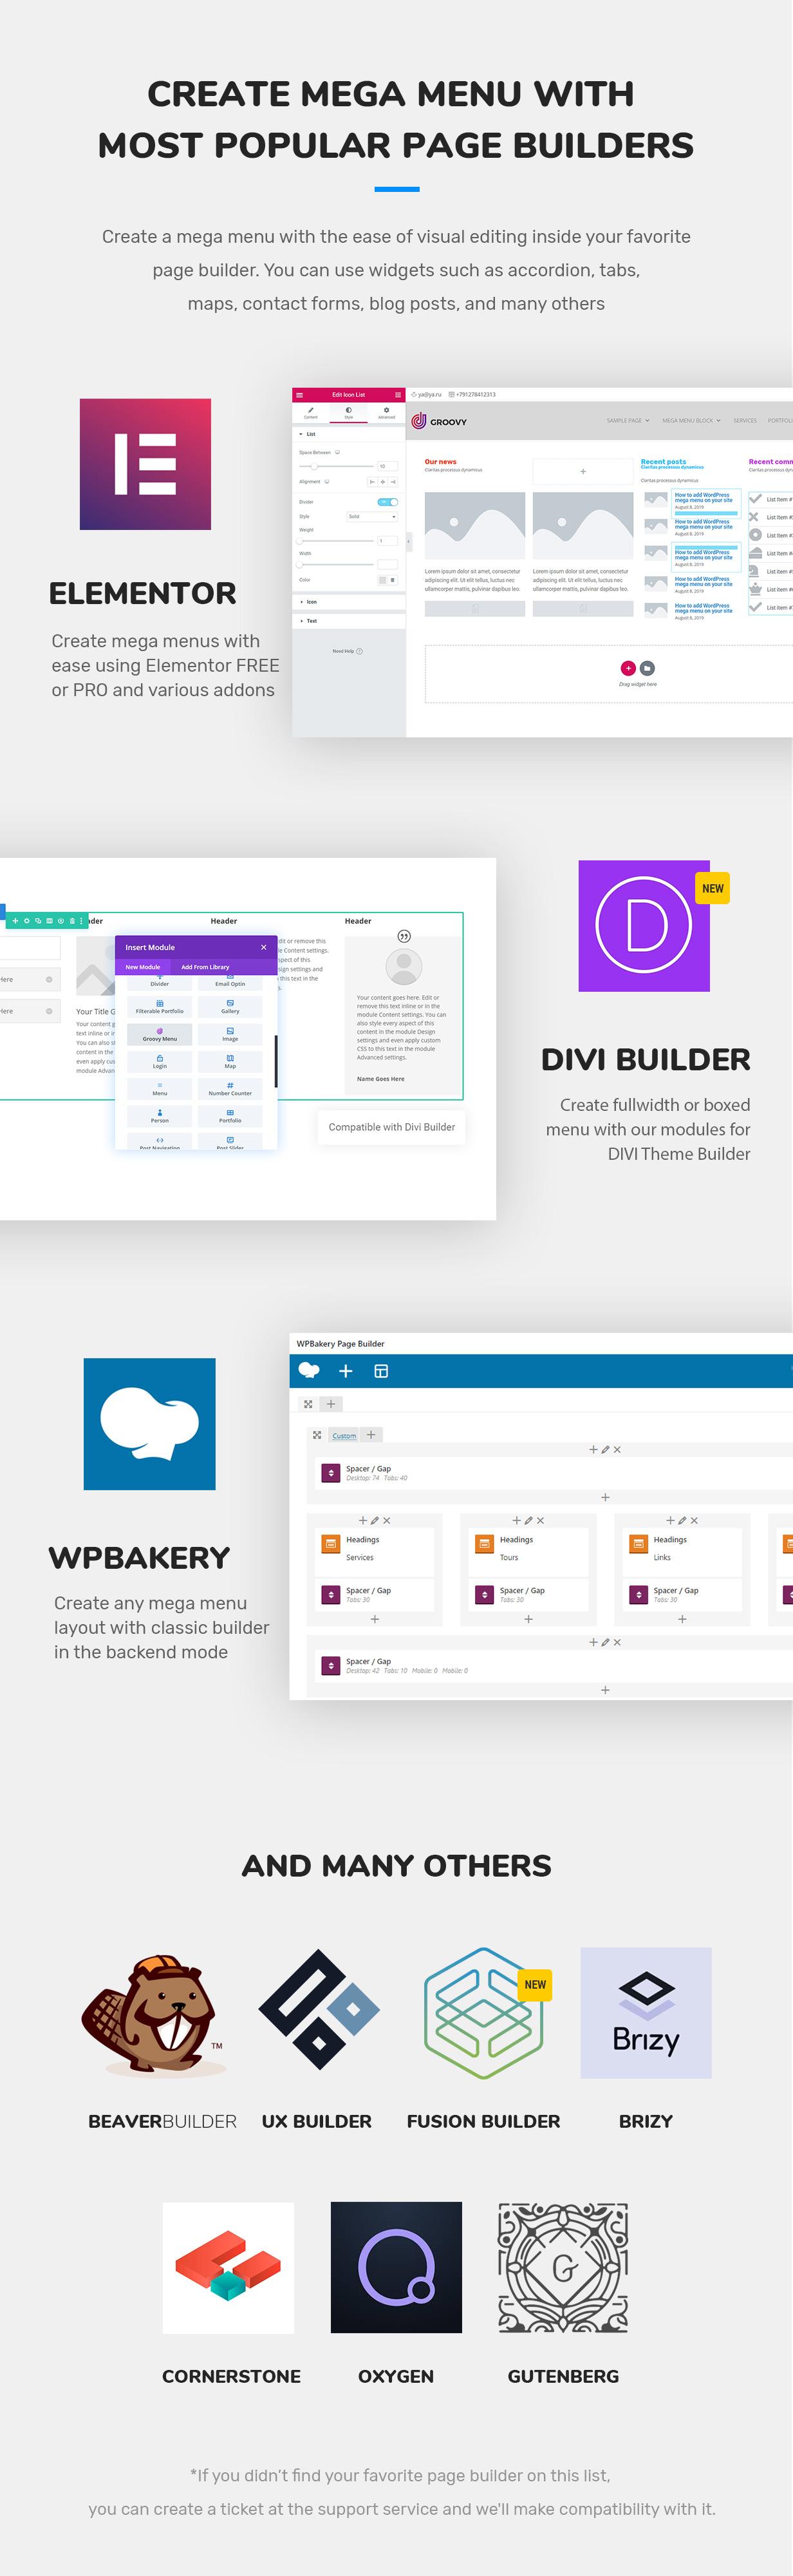 Groovy Mega Menu-WordPress大型超级菜单插件[更至v2.4.8]插图14